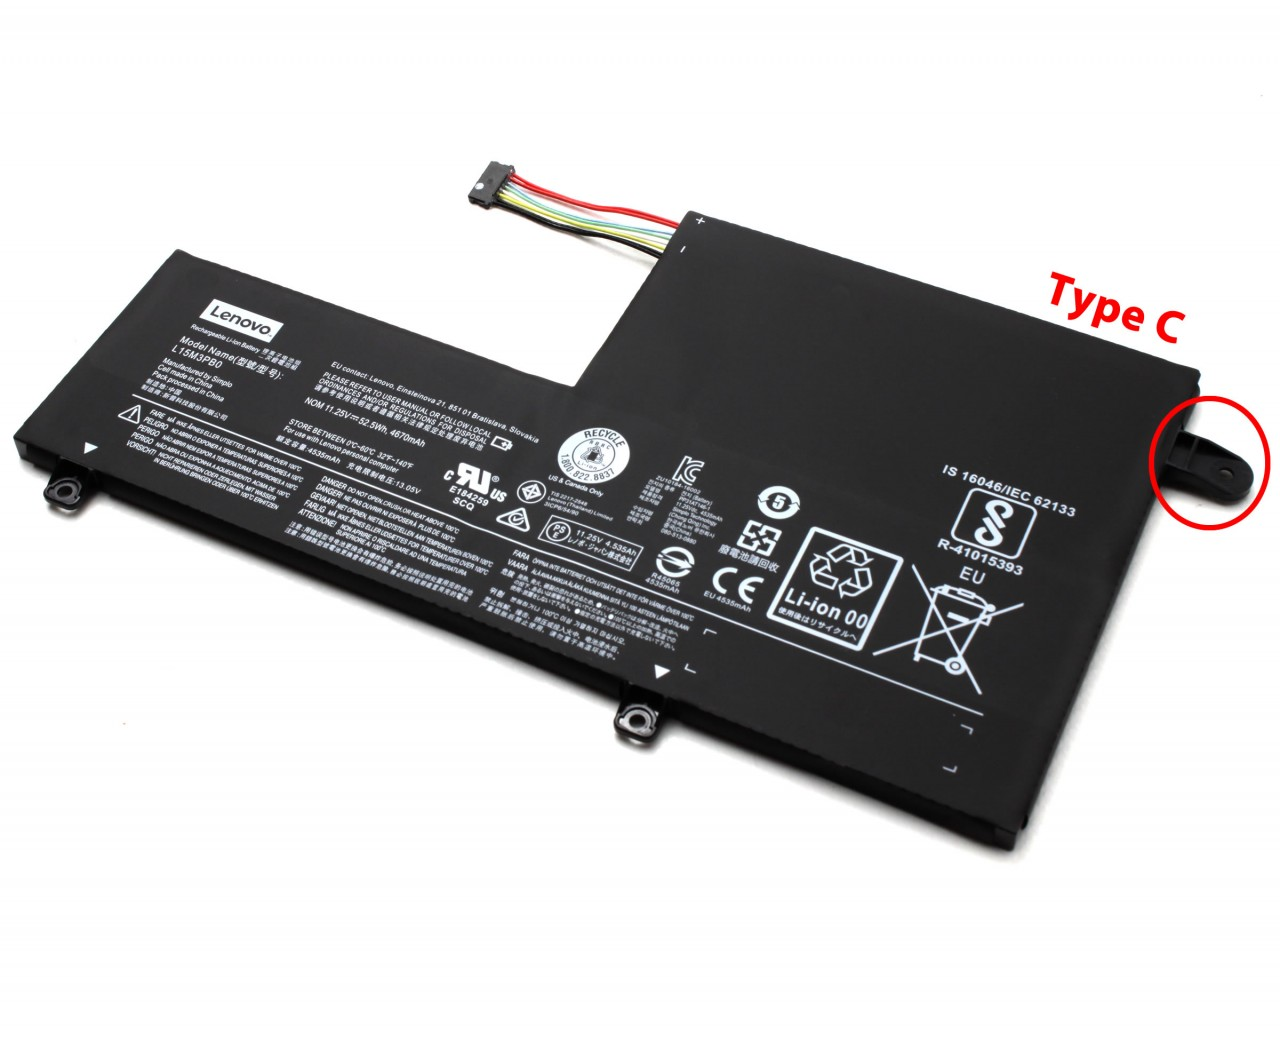 Baterie Lenovo IdeaPad 520S-14IKB Originala 52.5Wh Type C imagine powerlaptop.ro 2021